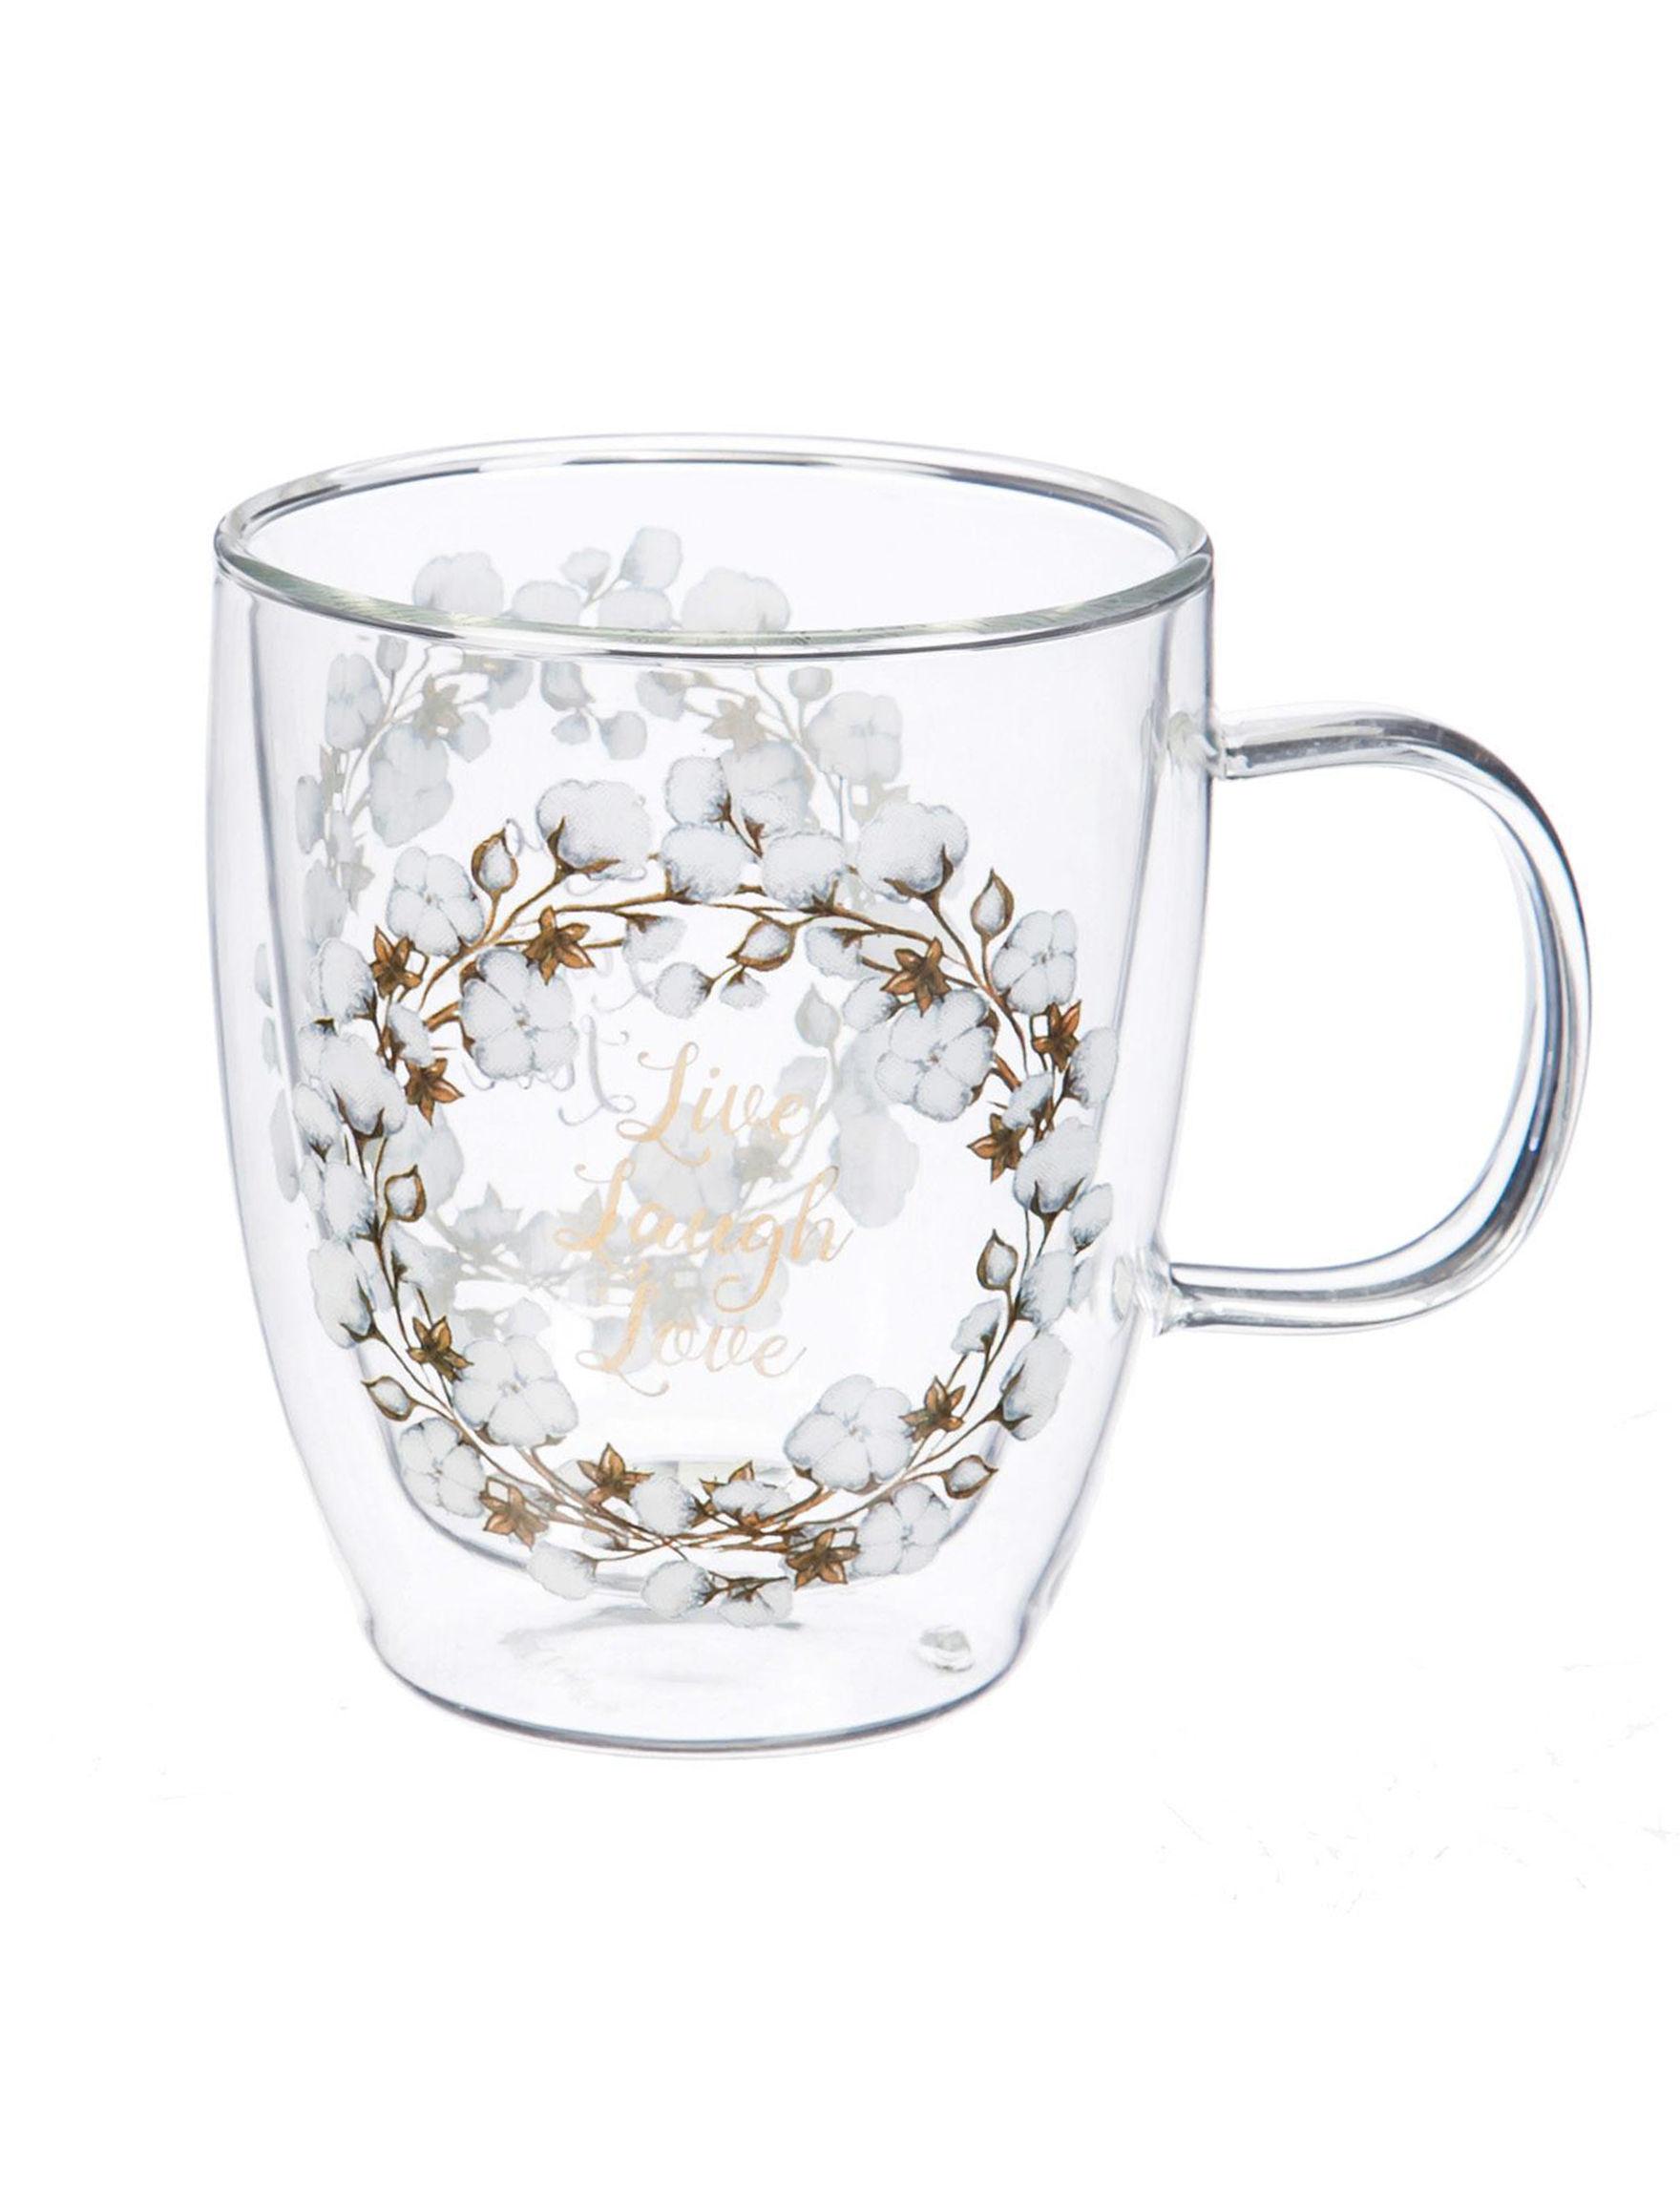 Evergreen Clear Mugs Drinkware